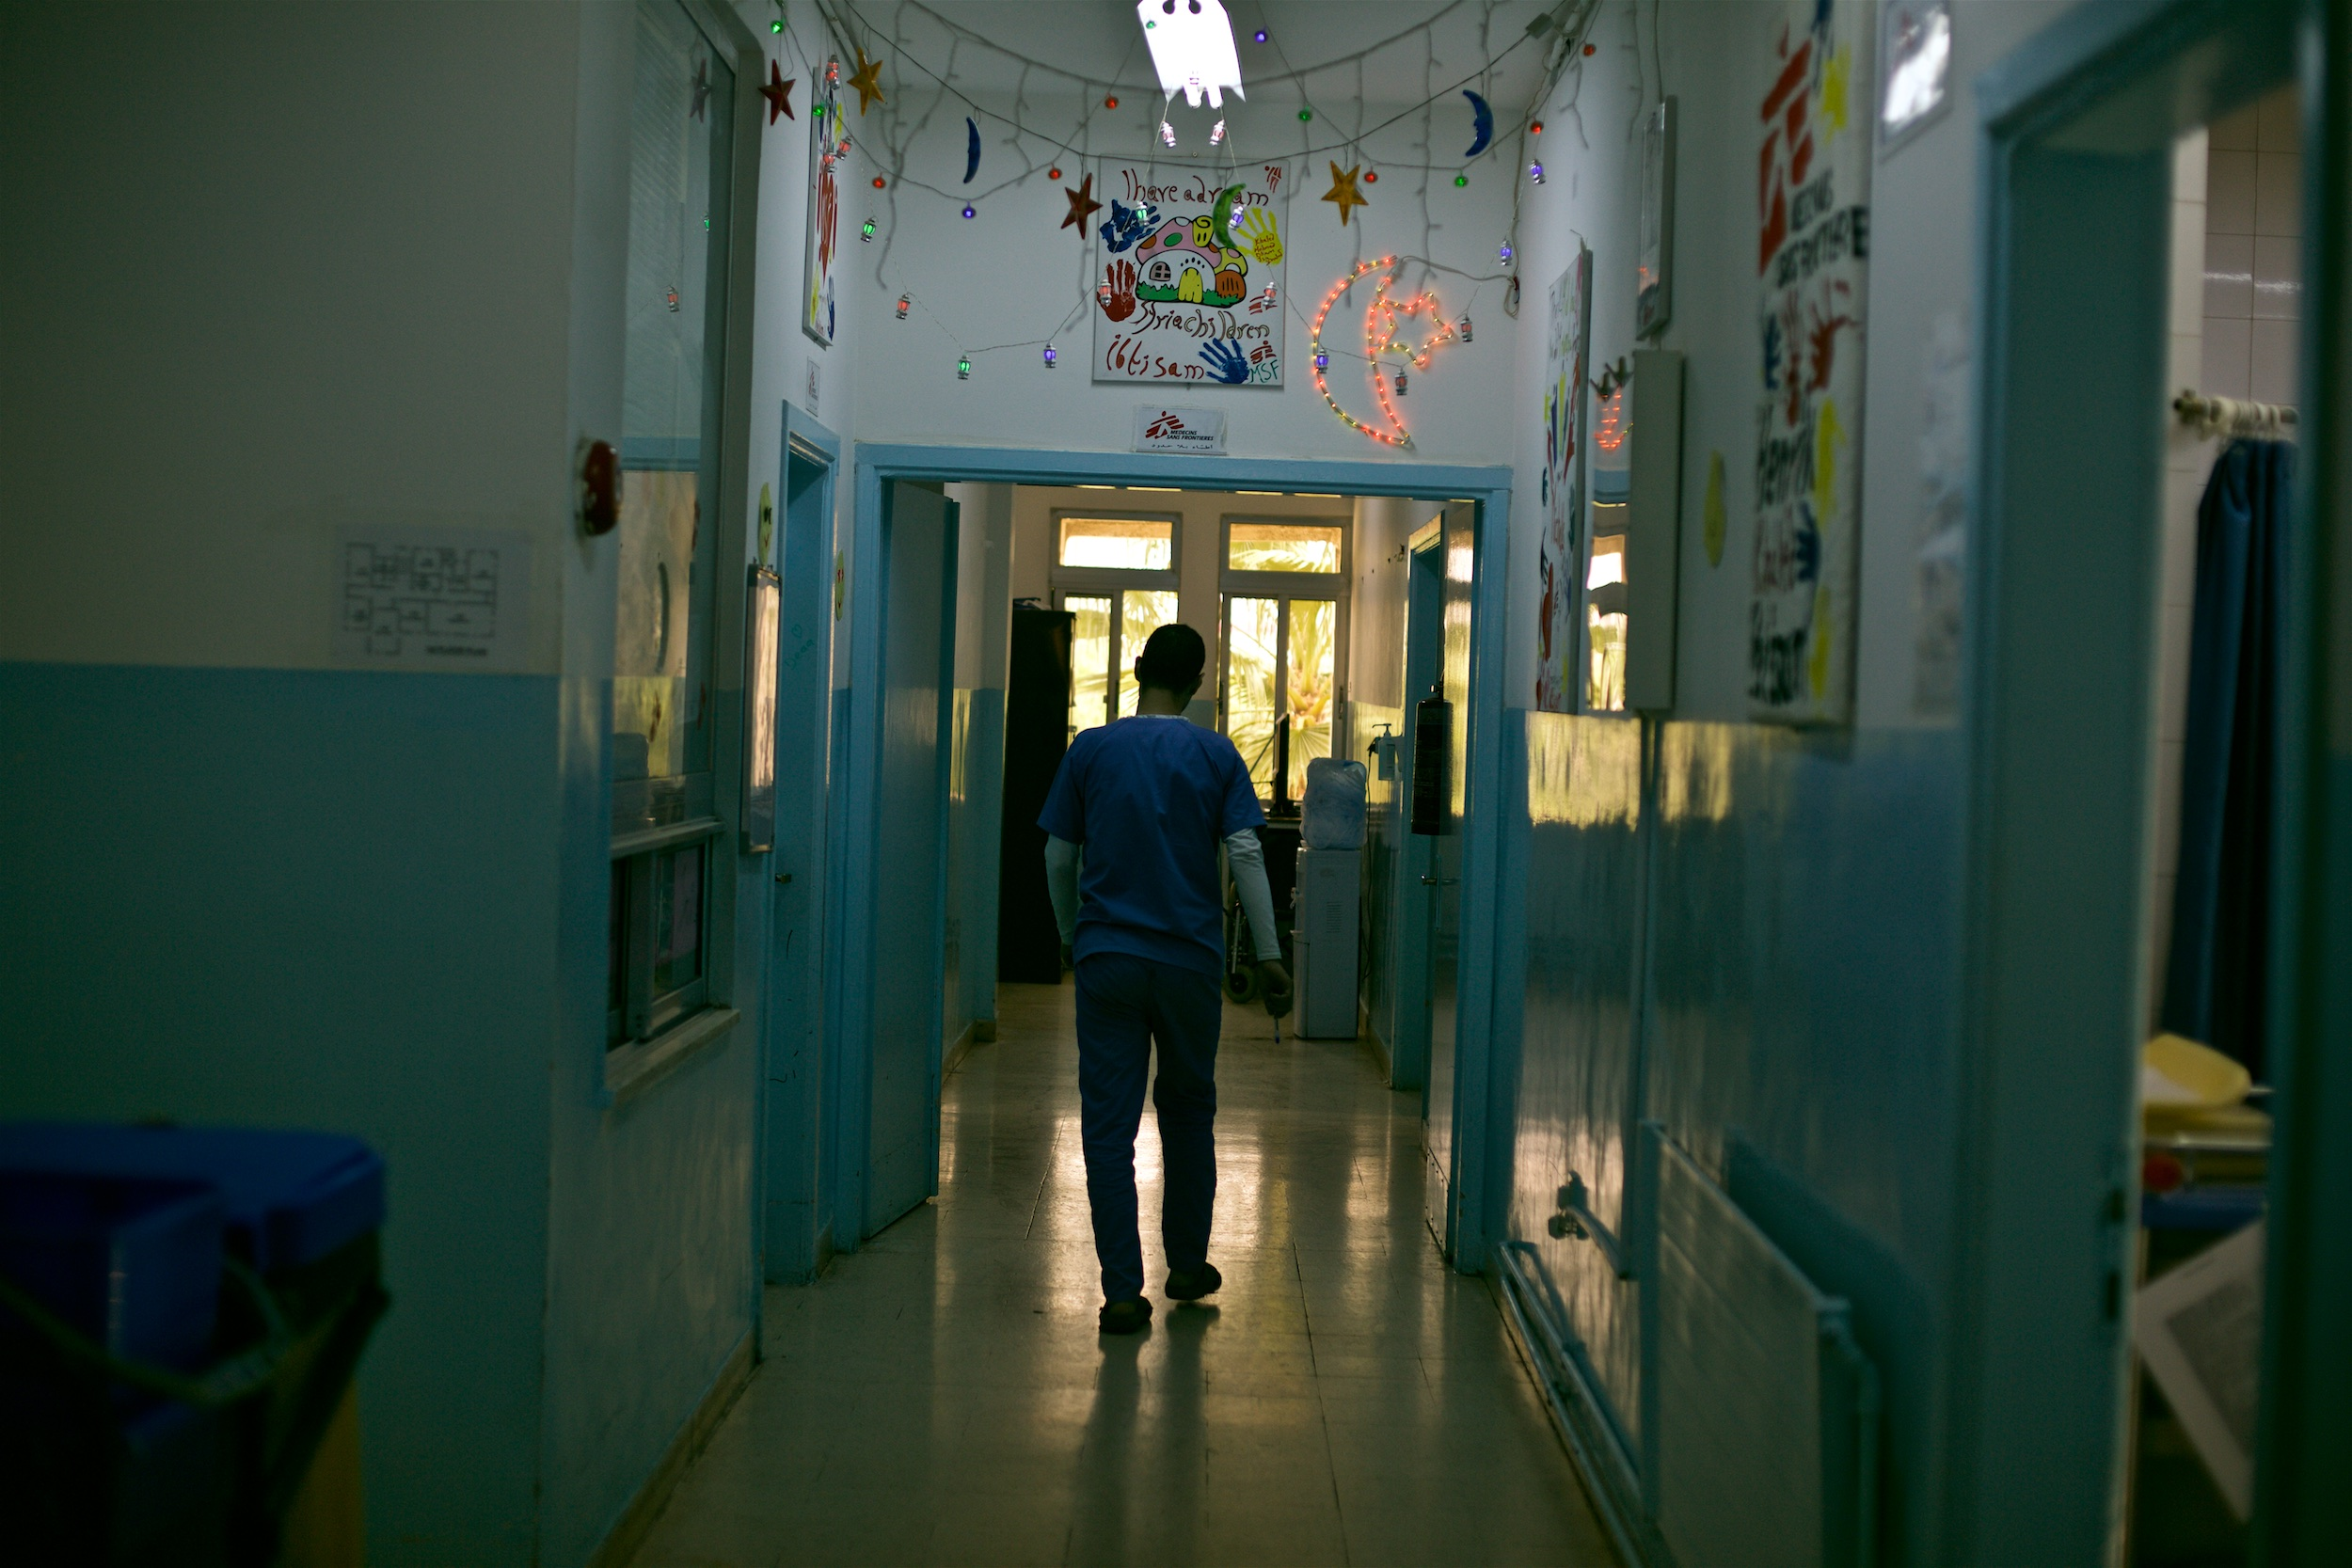 jordan-msf-al-ramtha-dectors-without-borders-war-hospital-refugee-camp-denis-bosnic-16.jpg